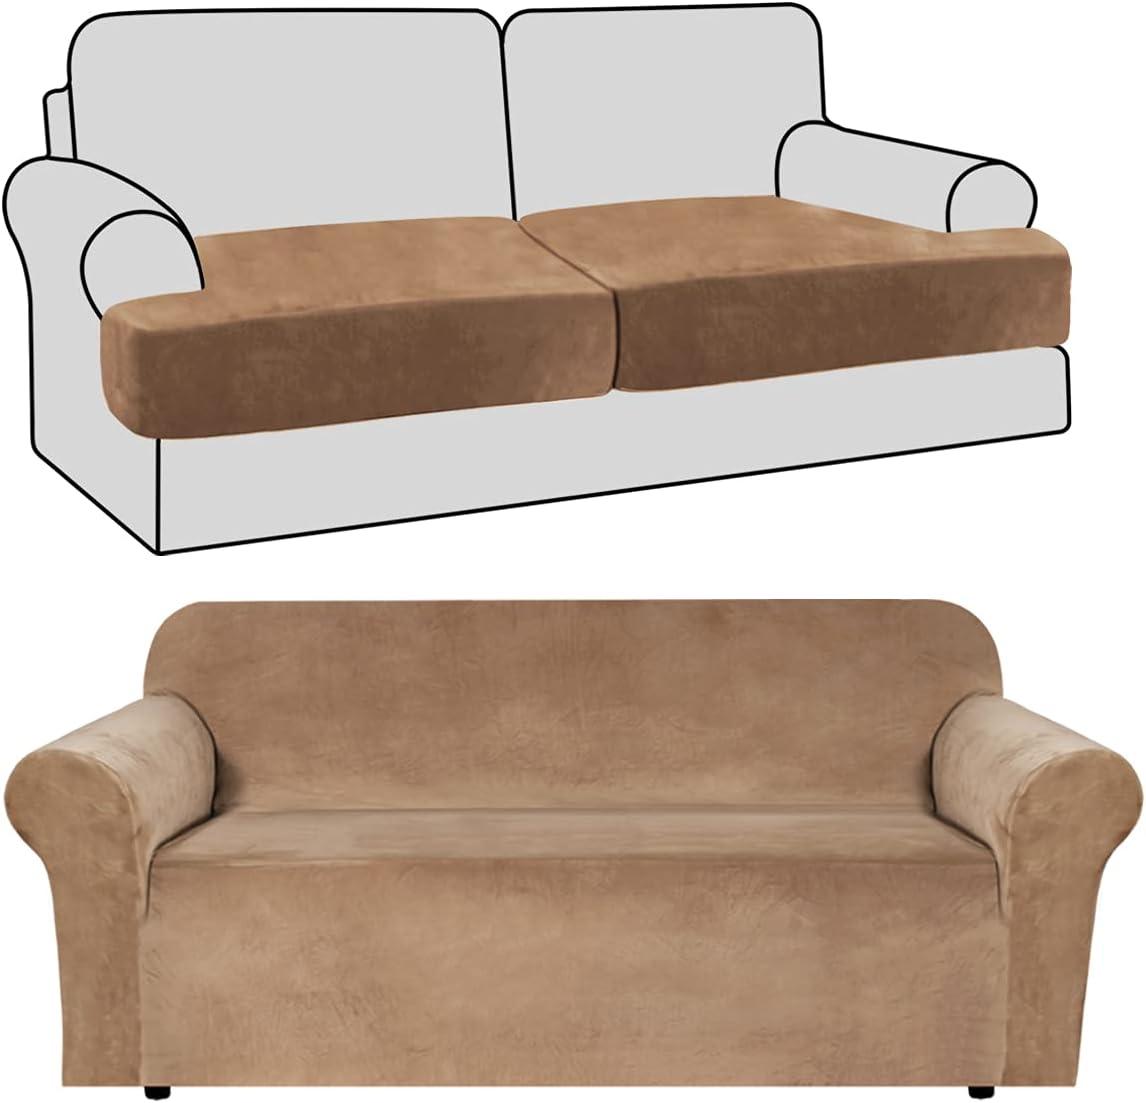 Memphis Mall H.VERSAILTEX Stretch Velvet Sofa Covers Jacksonville Mall and T Cushion Piece 2 So